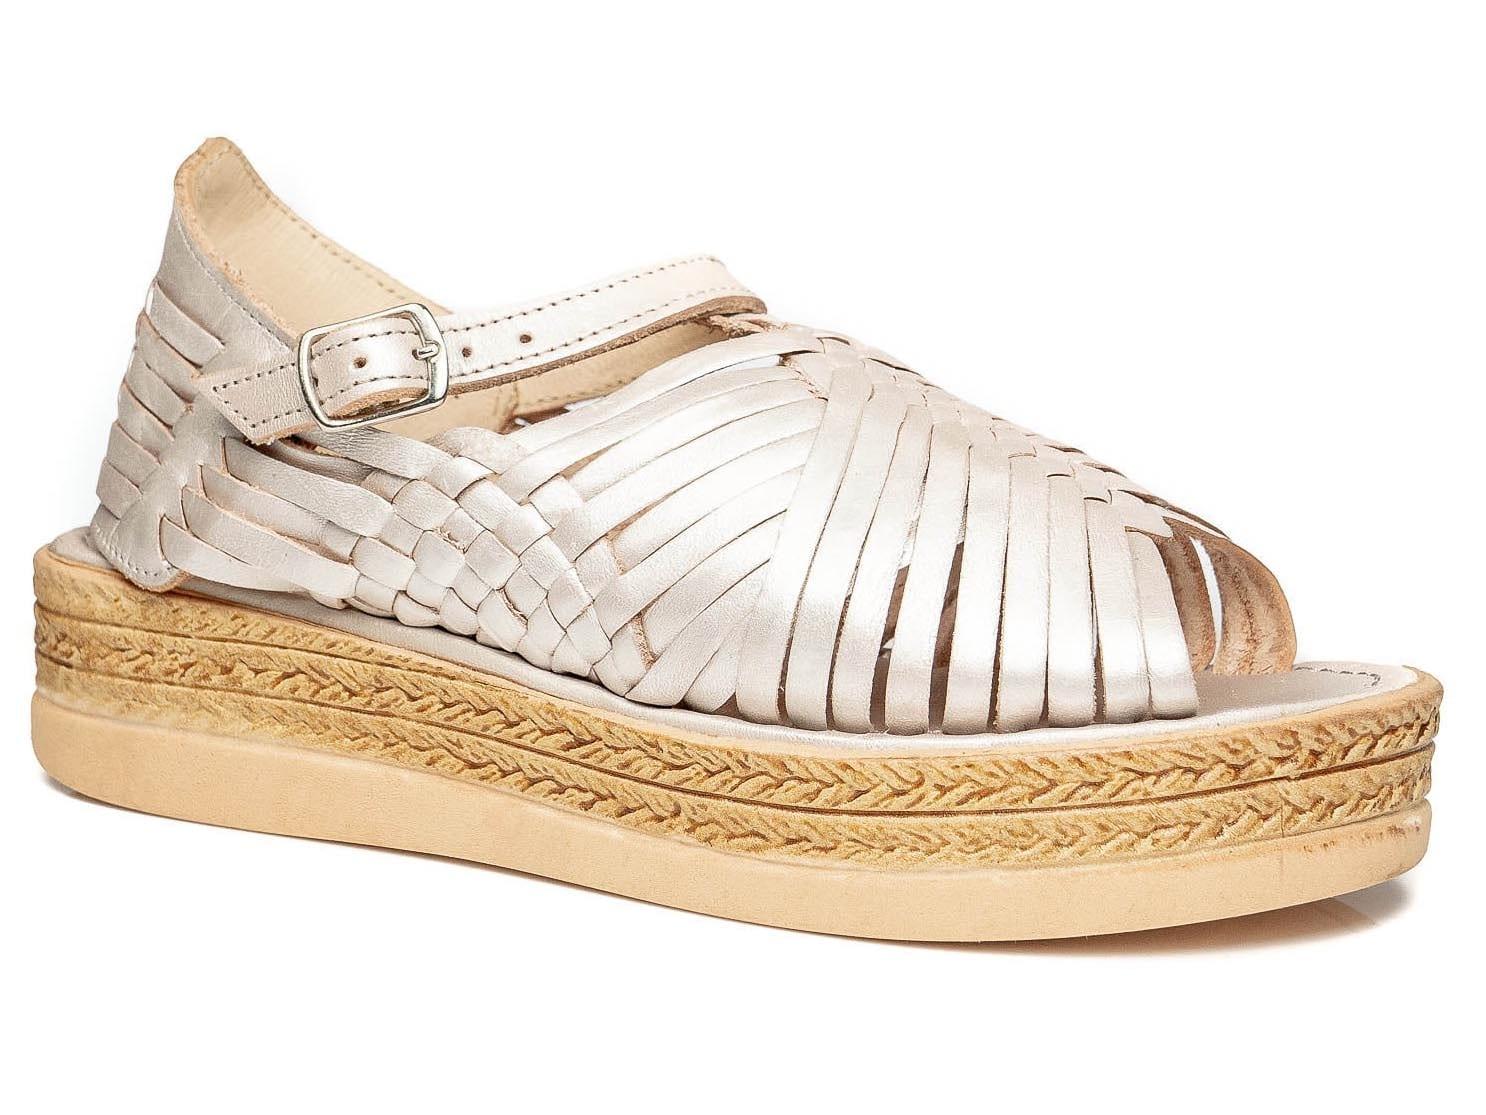 Chloe Raised Sandals Pearl